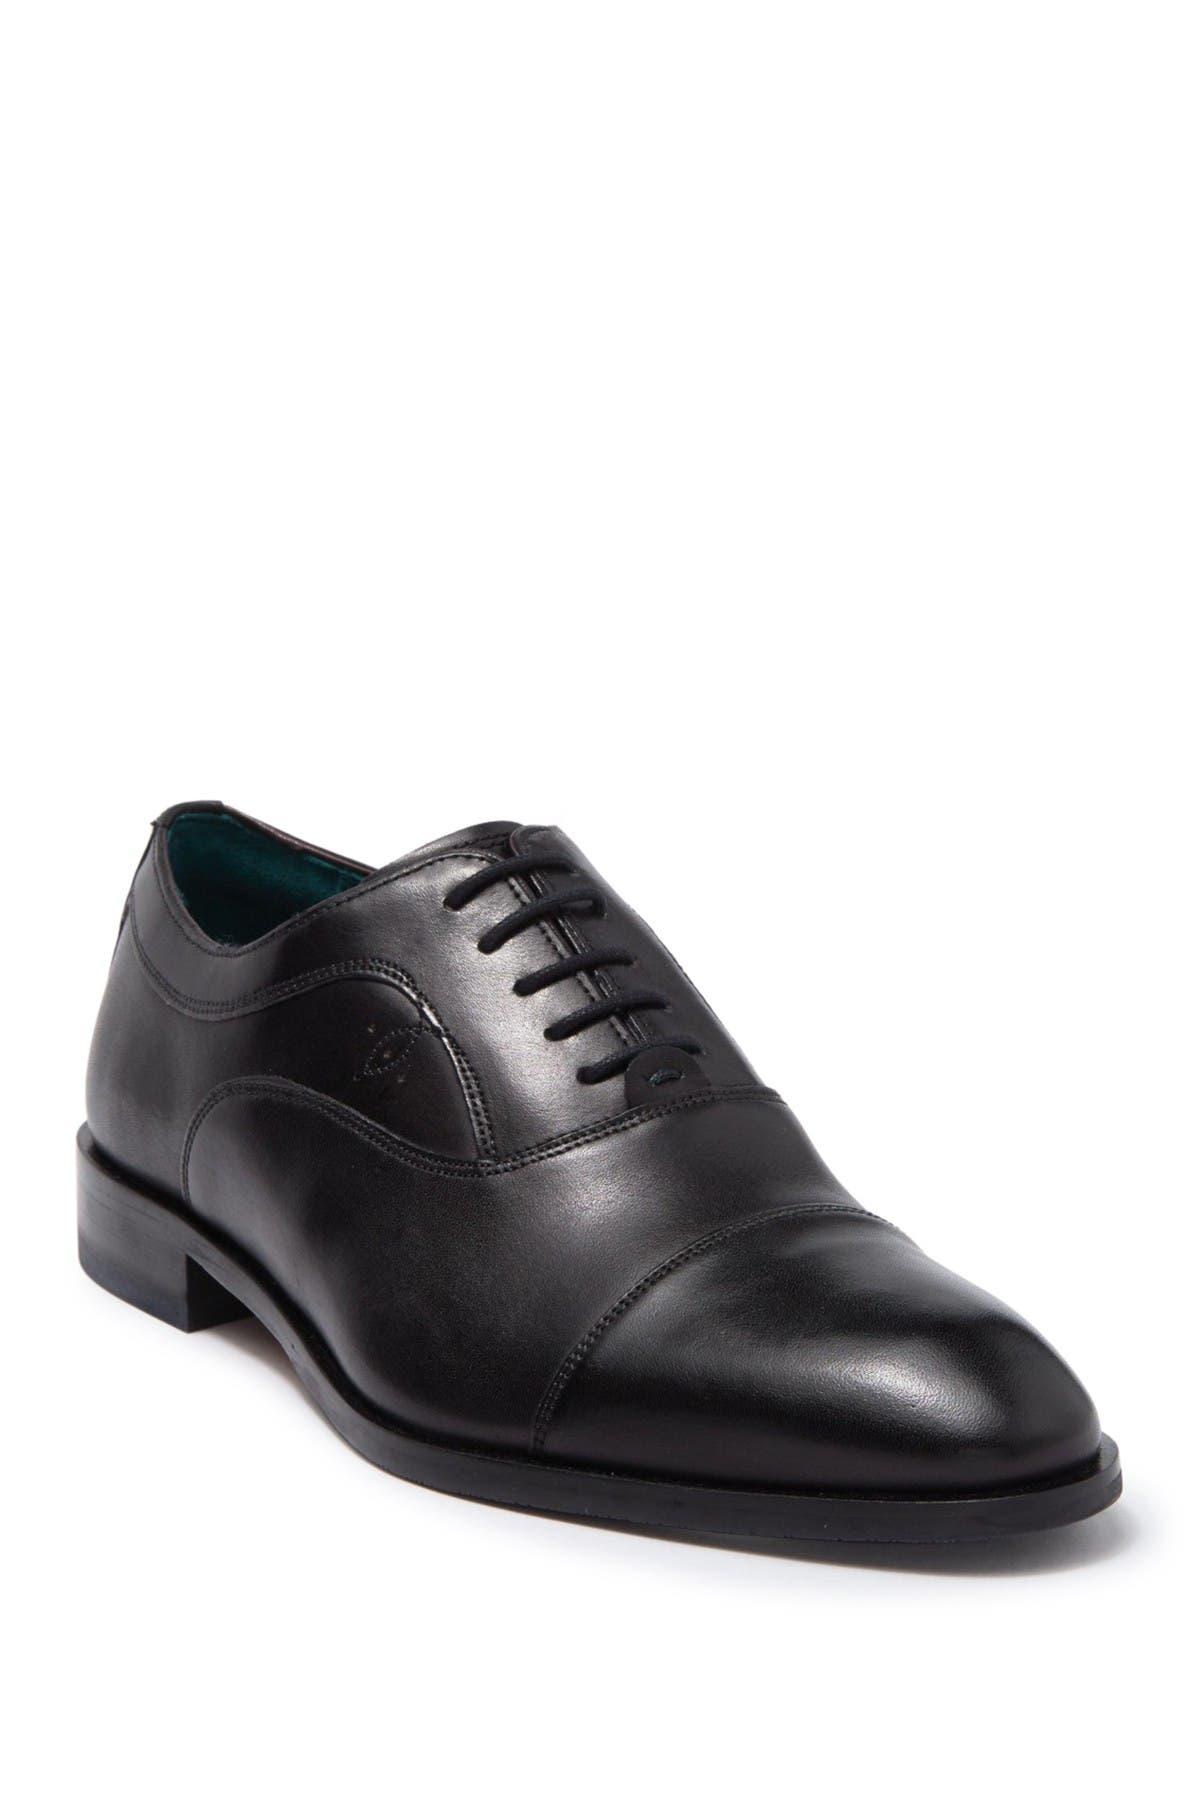 Ted Baker London Shoes for Men